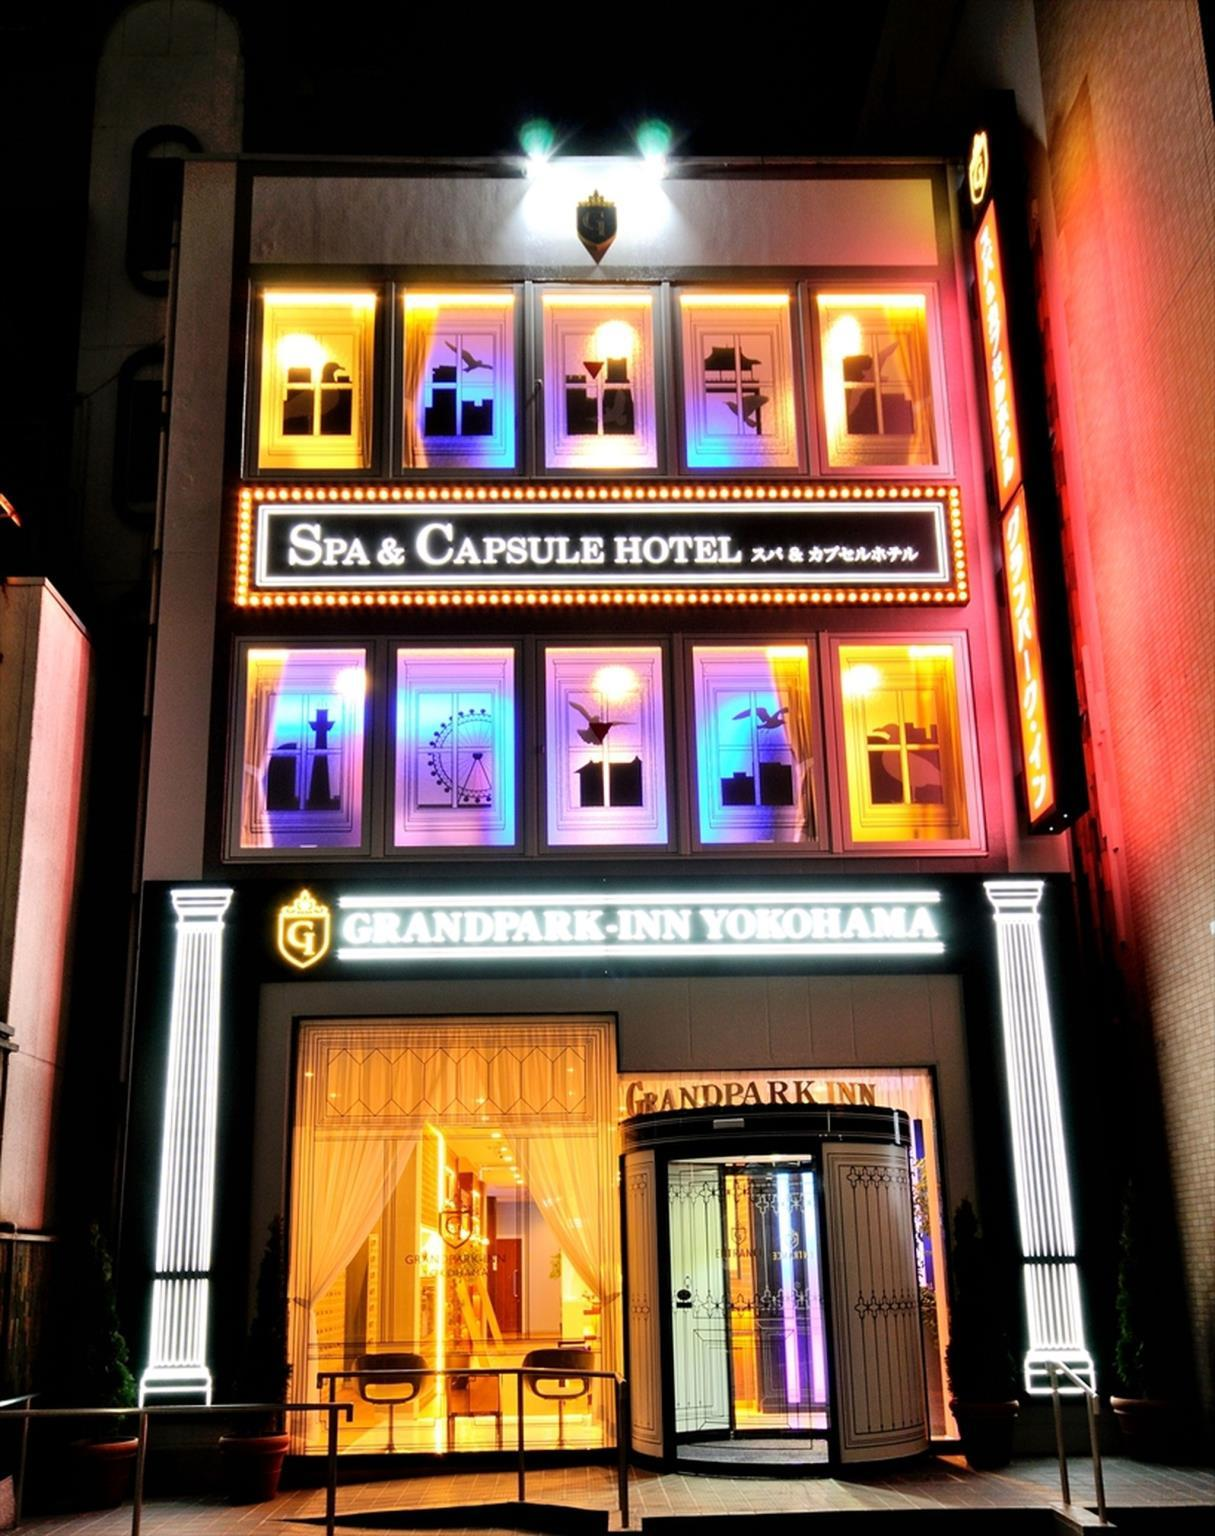 Spa & Capsule Hotel GrandPark Inn Yokohama, Yokohama